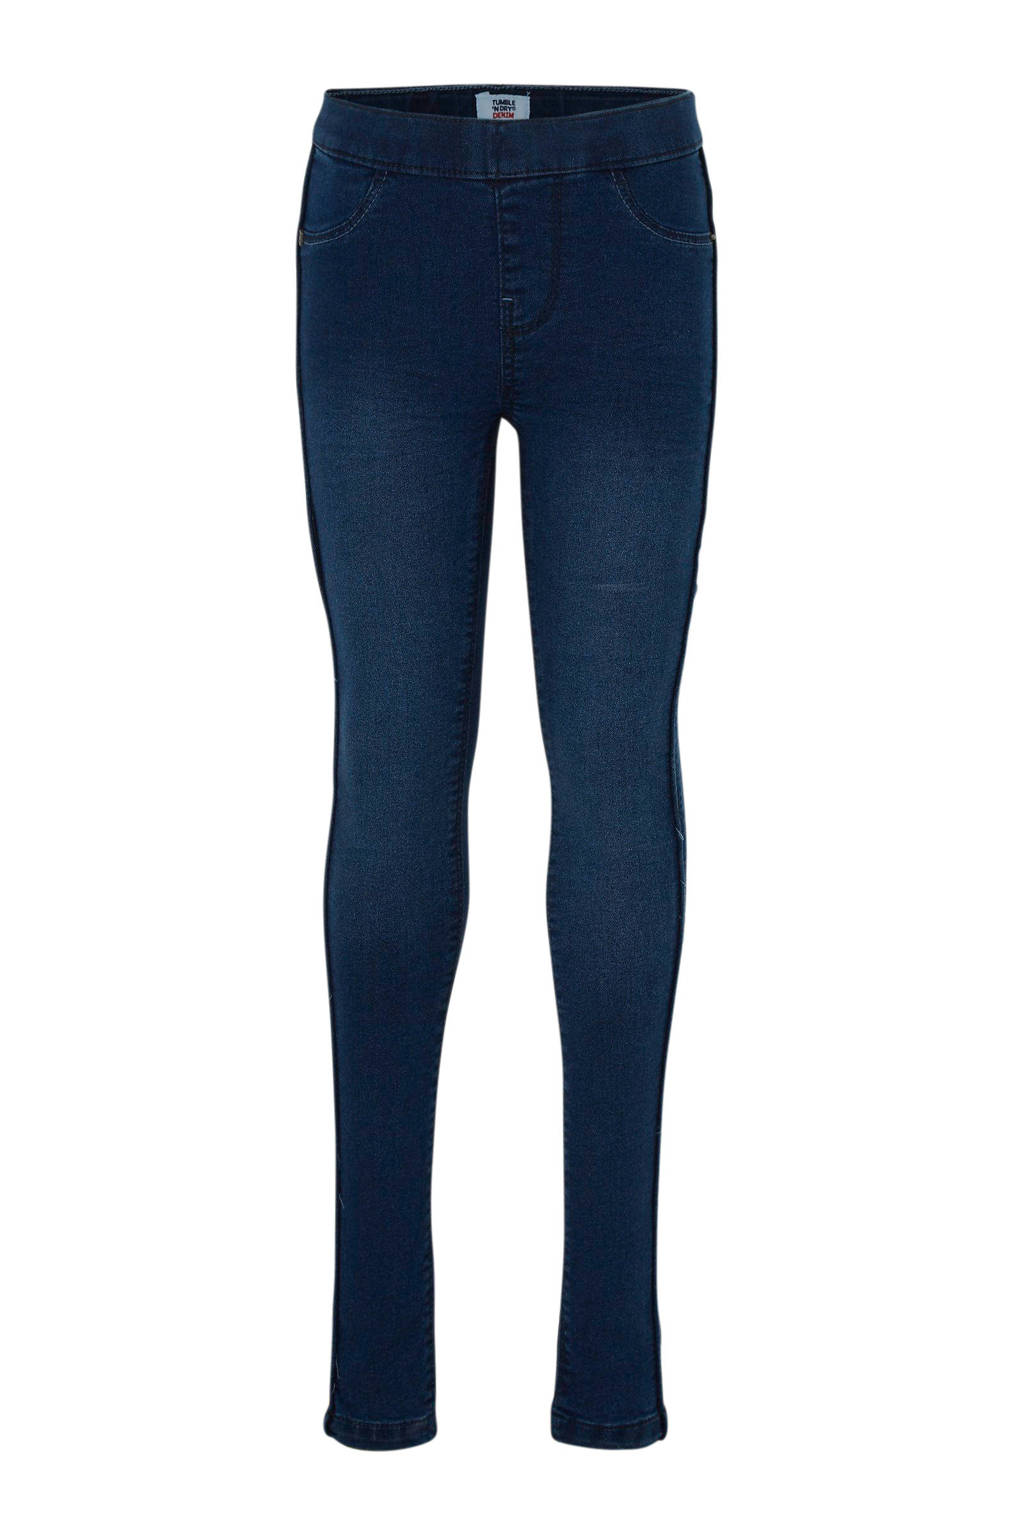 Tumble 'n Dry Hi slim fit jeans denim medium used, Denim medium used